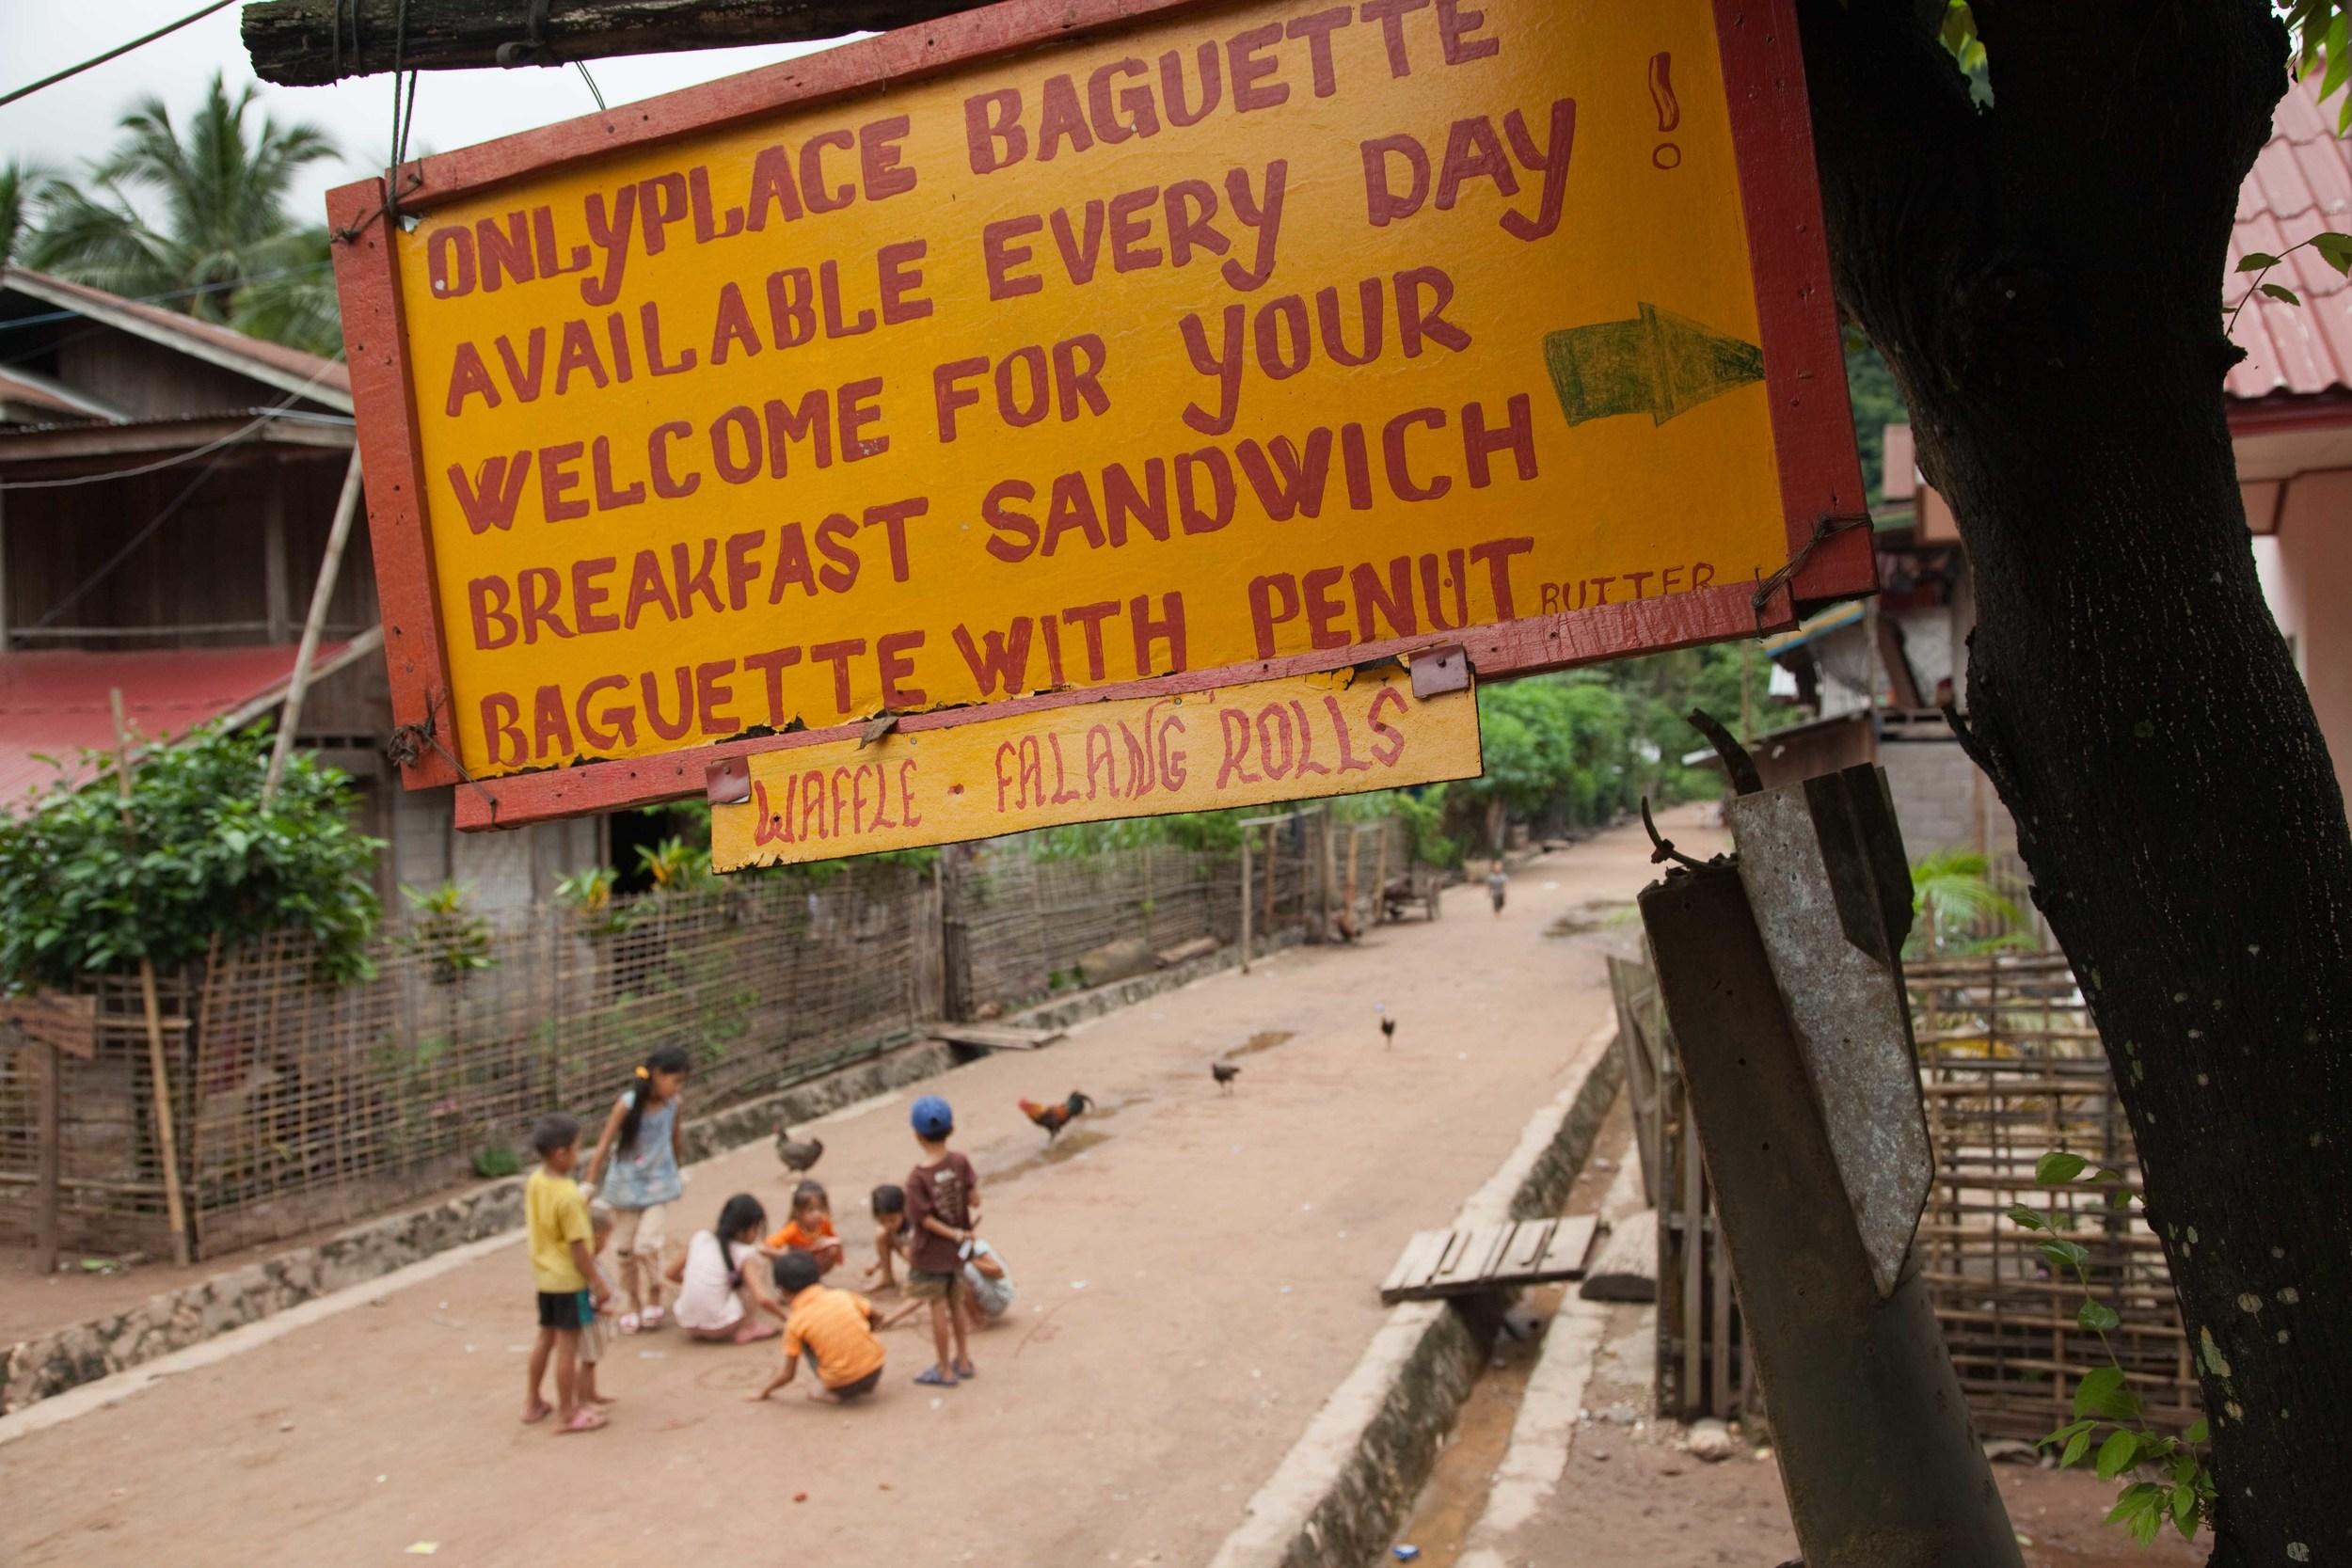 Phone Keo Restaurant in Muang Ngoi, advertising the Falang Roll. Credit: Andy Isaacson